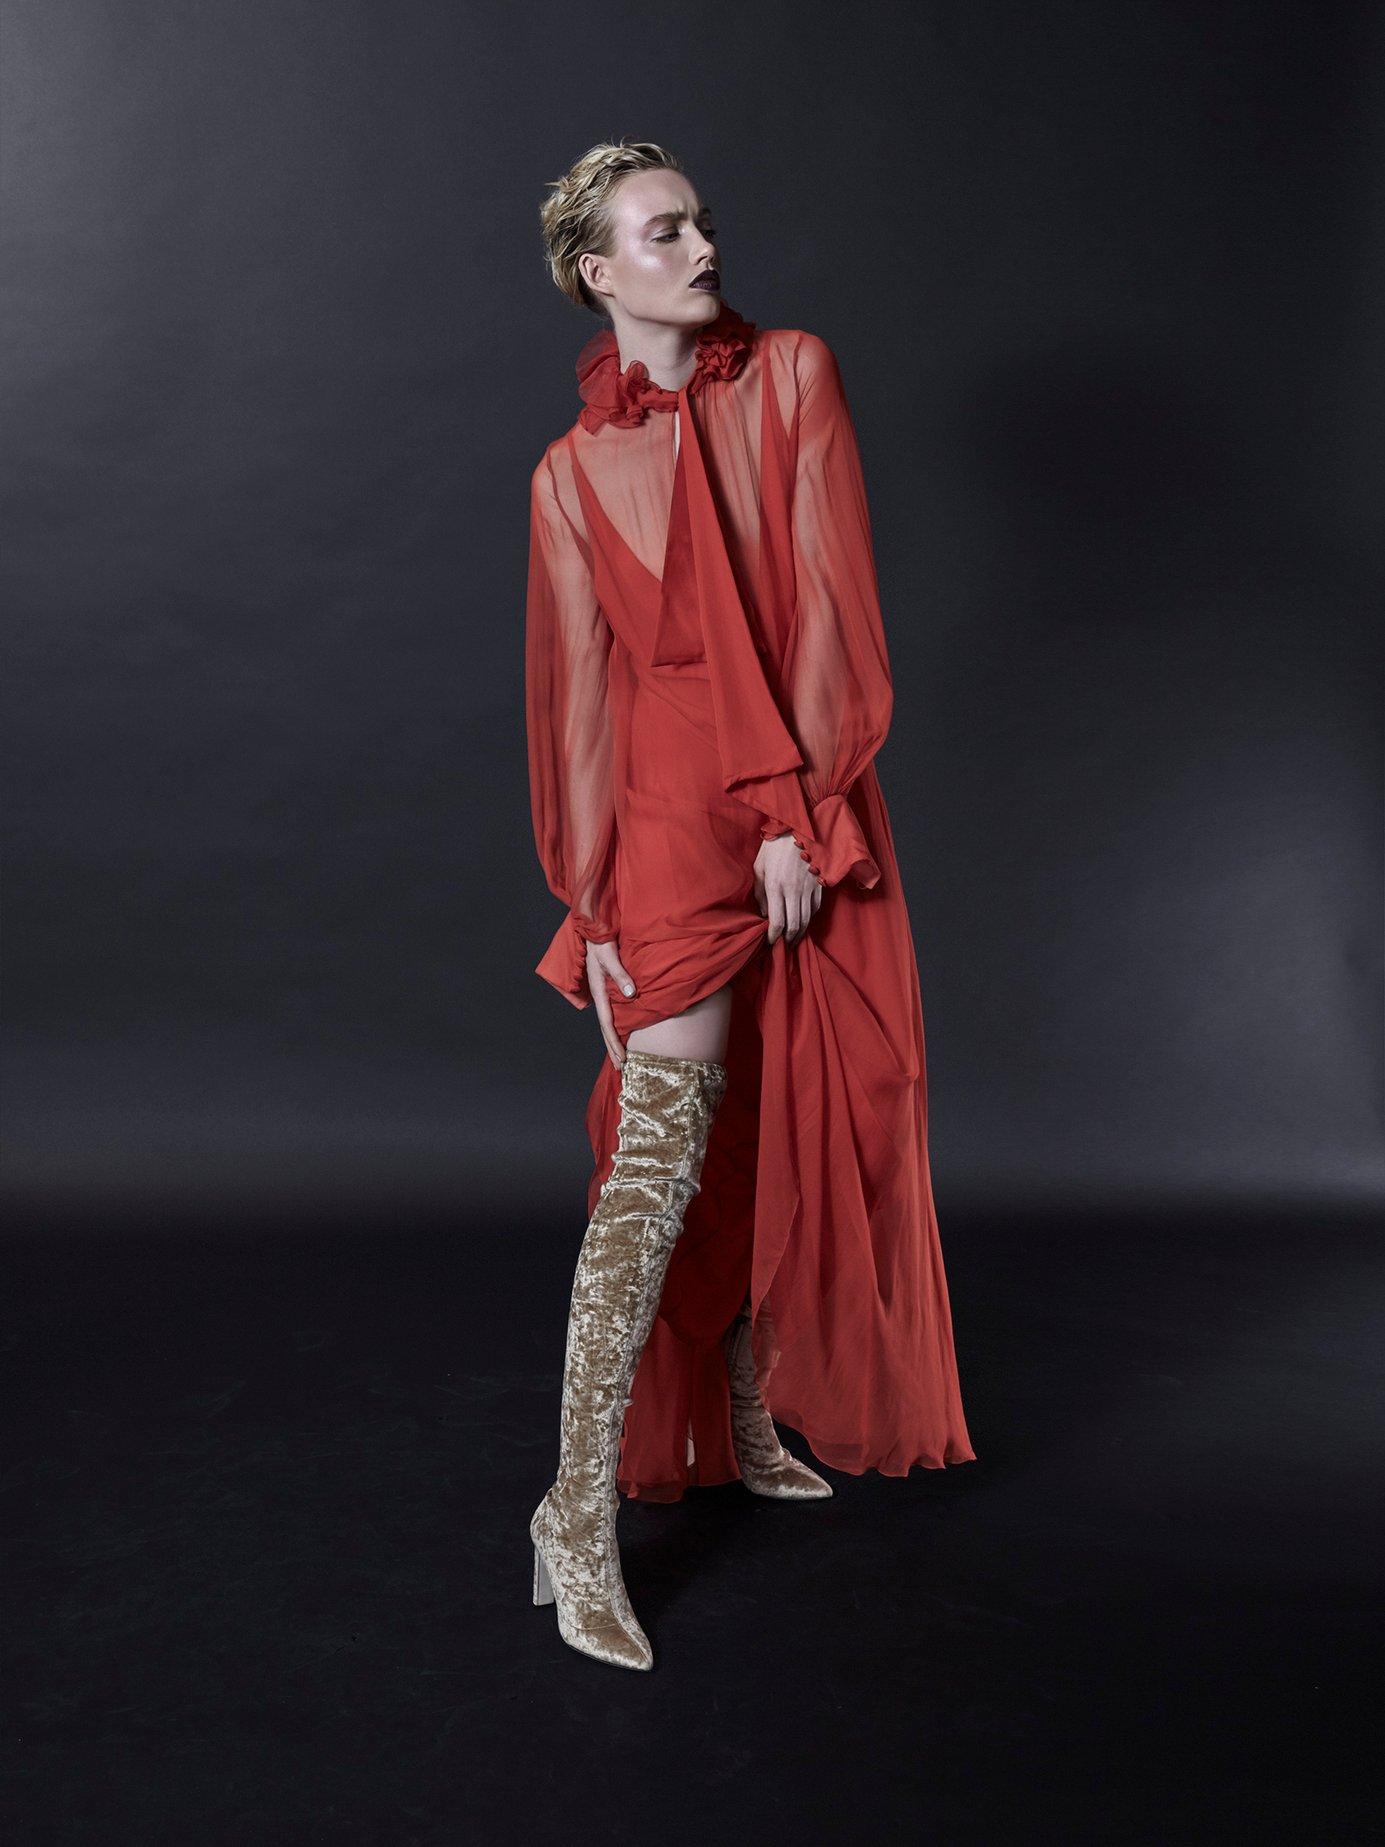 Lorraine velvet over-the-knee boots by Jimmy Choo